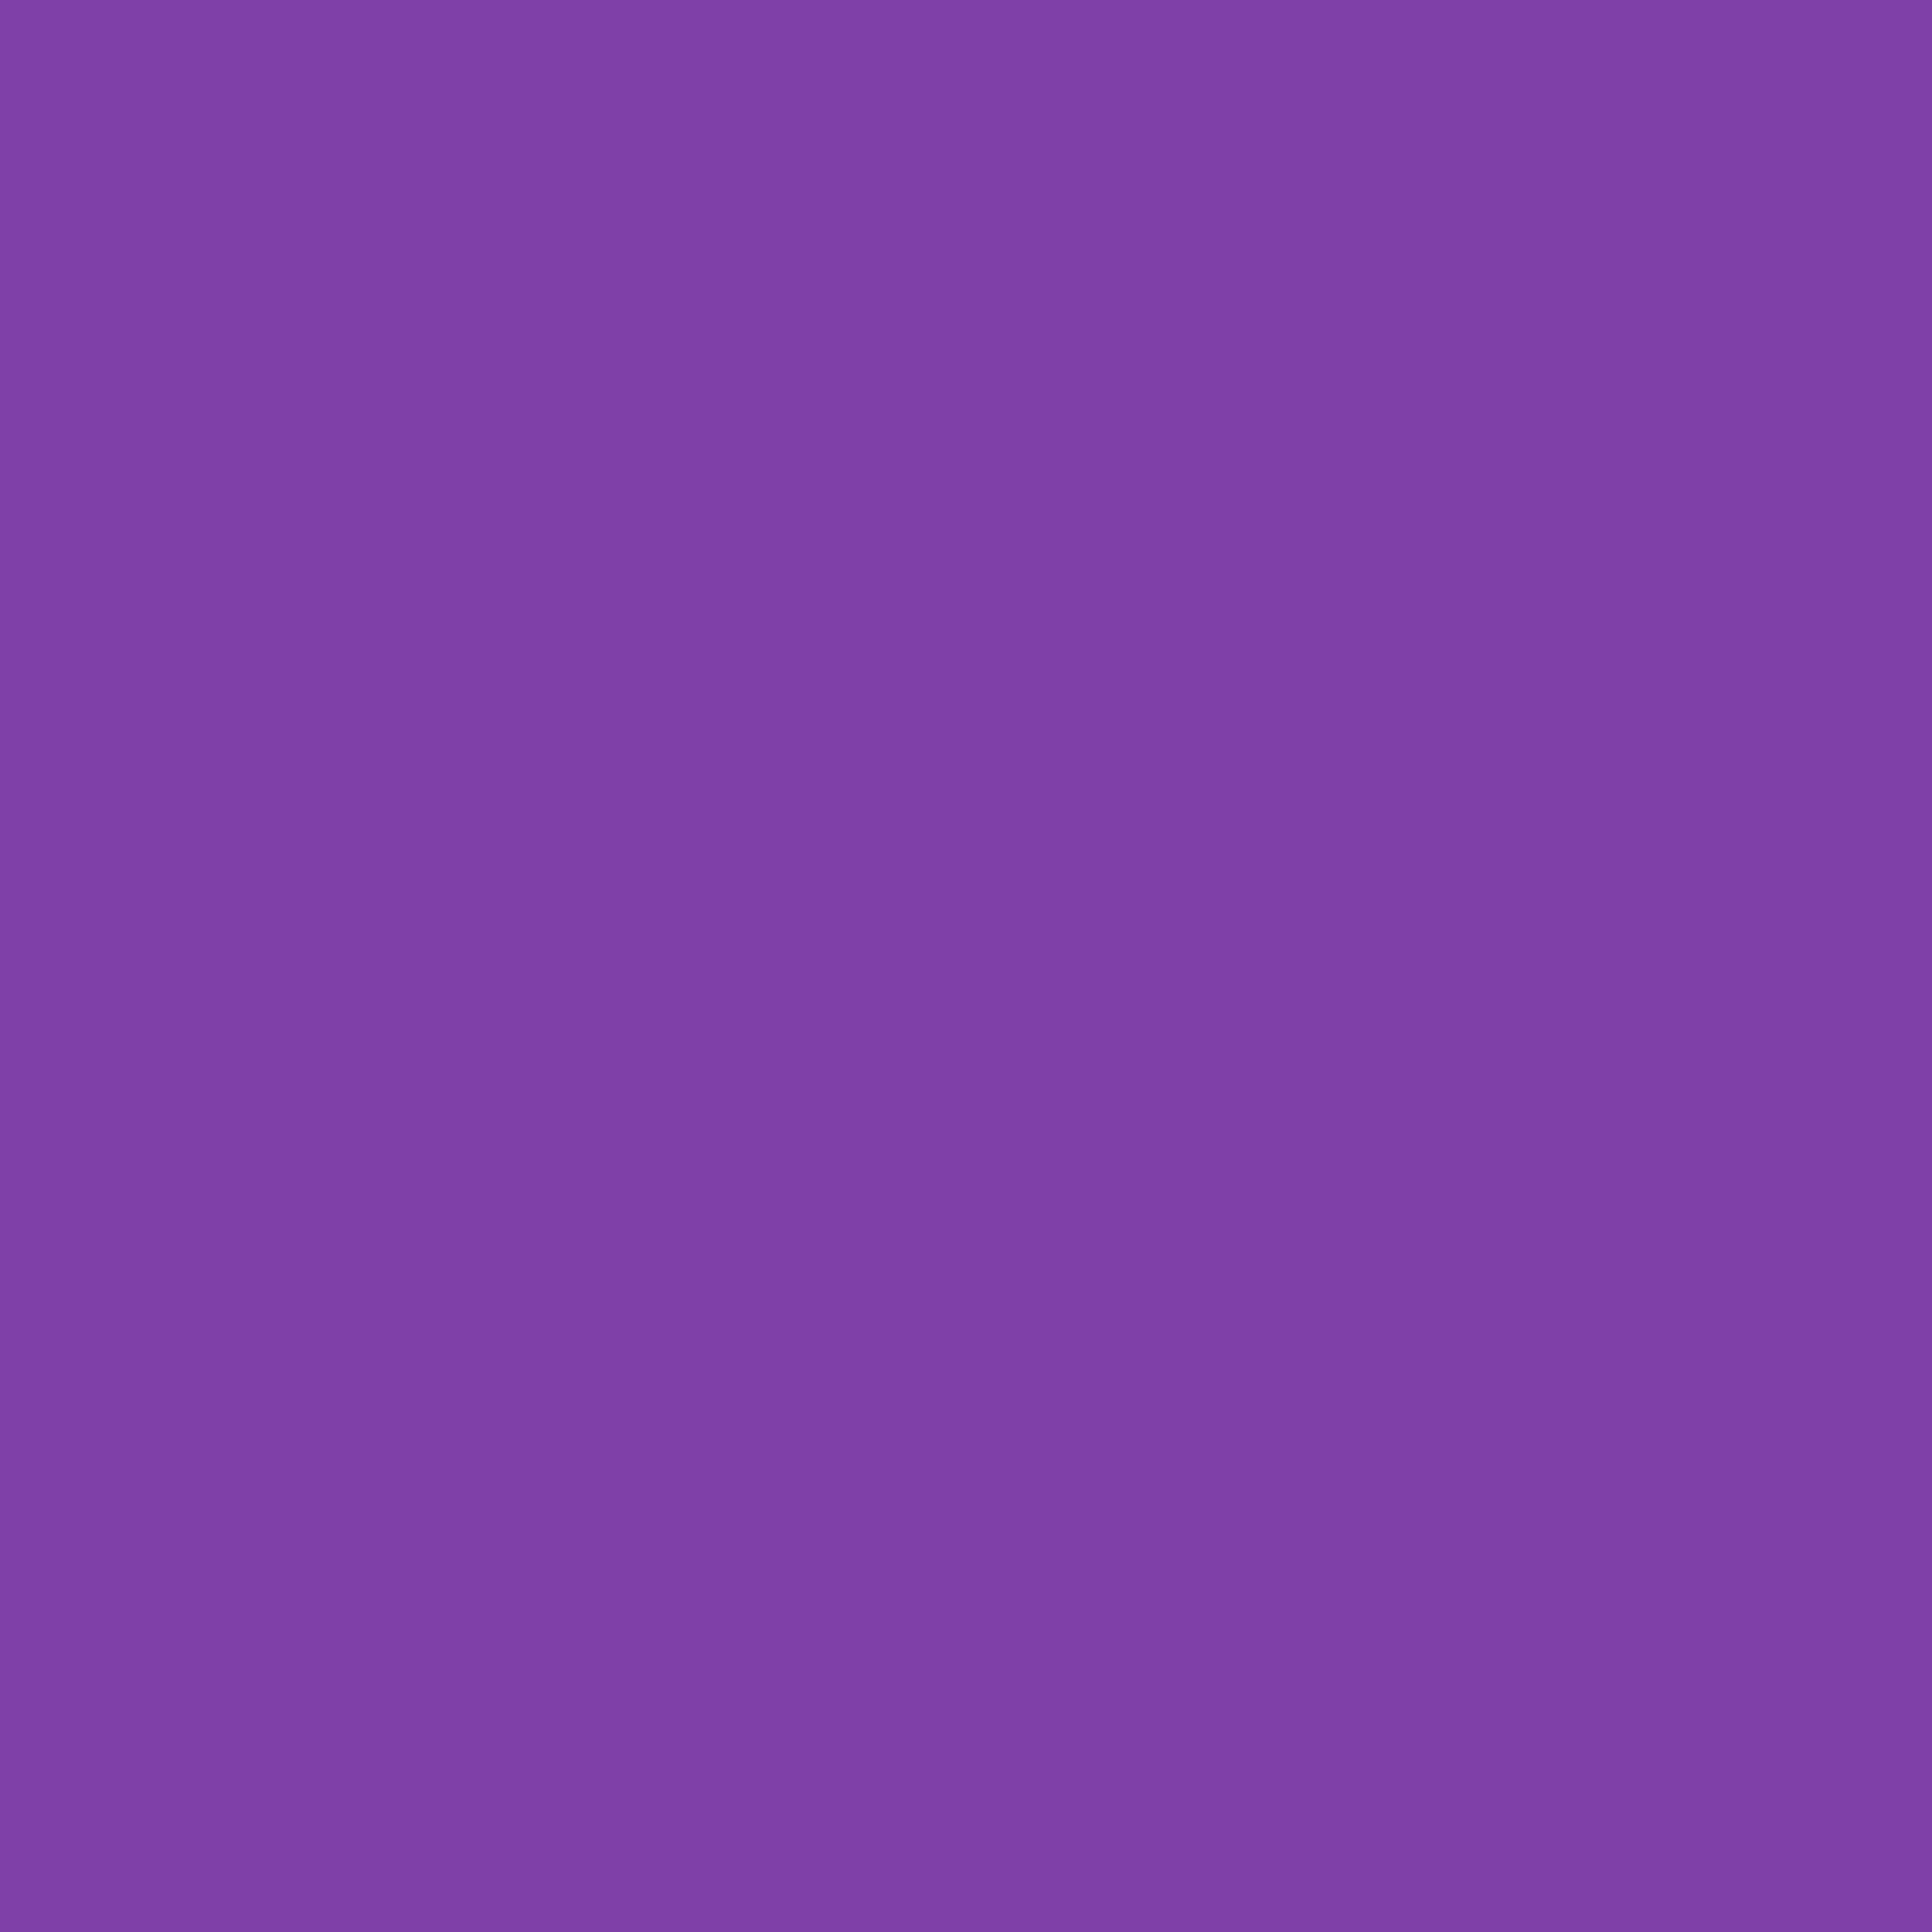 Neonviolett